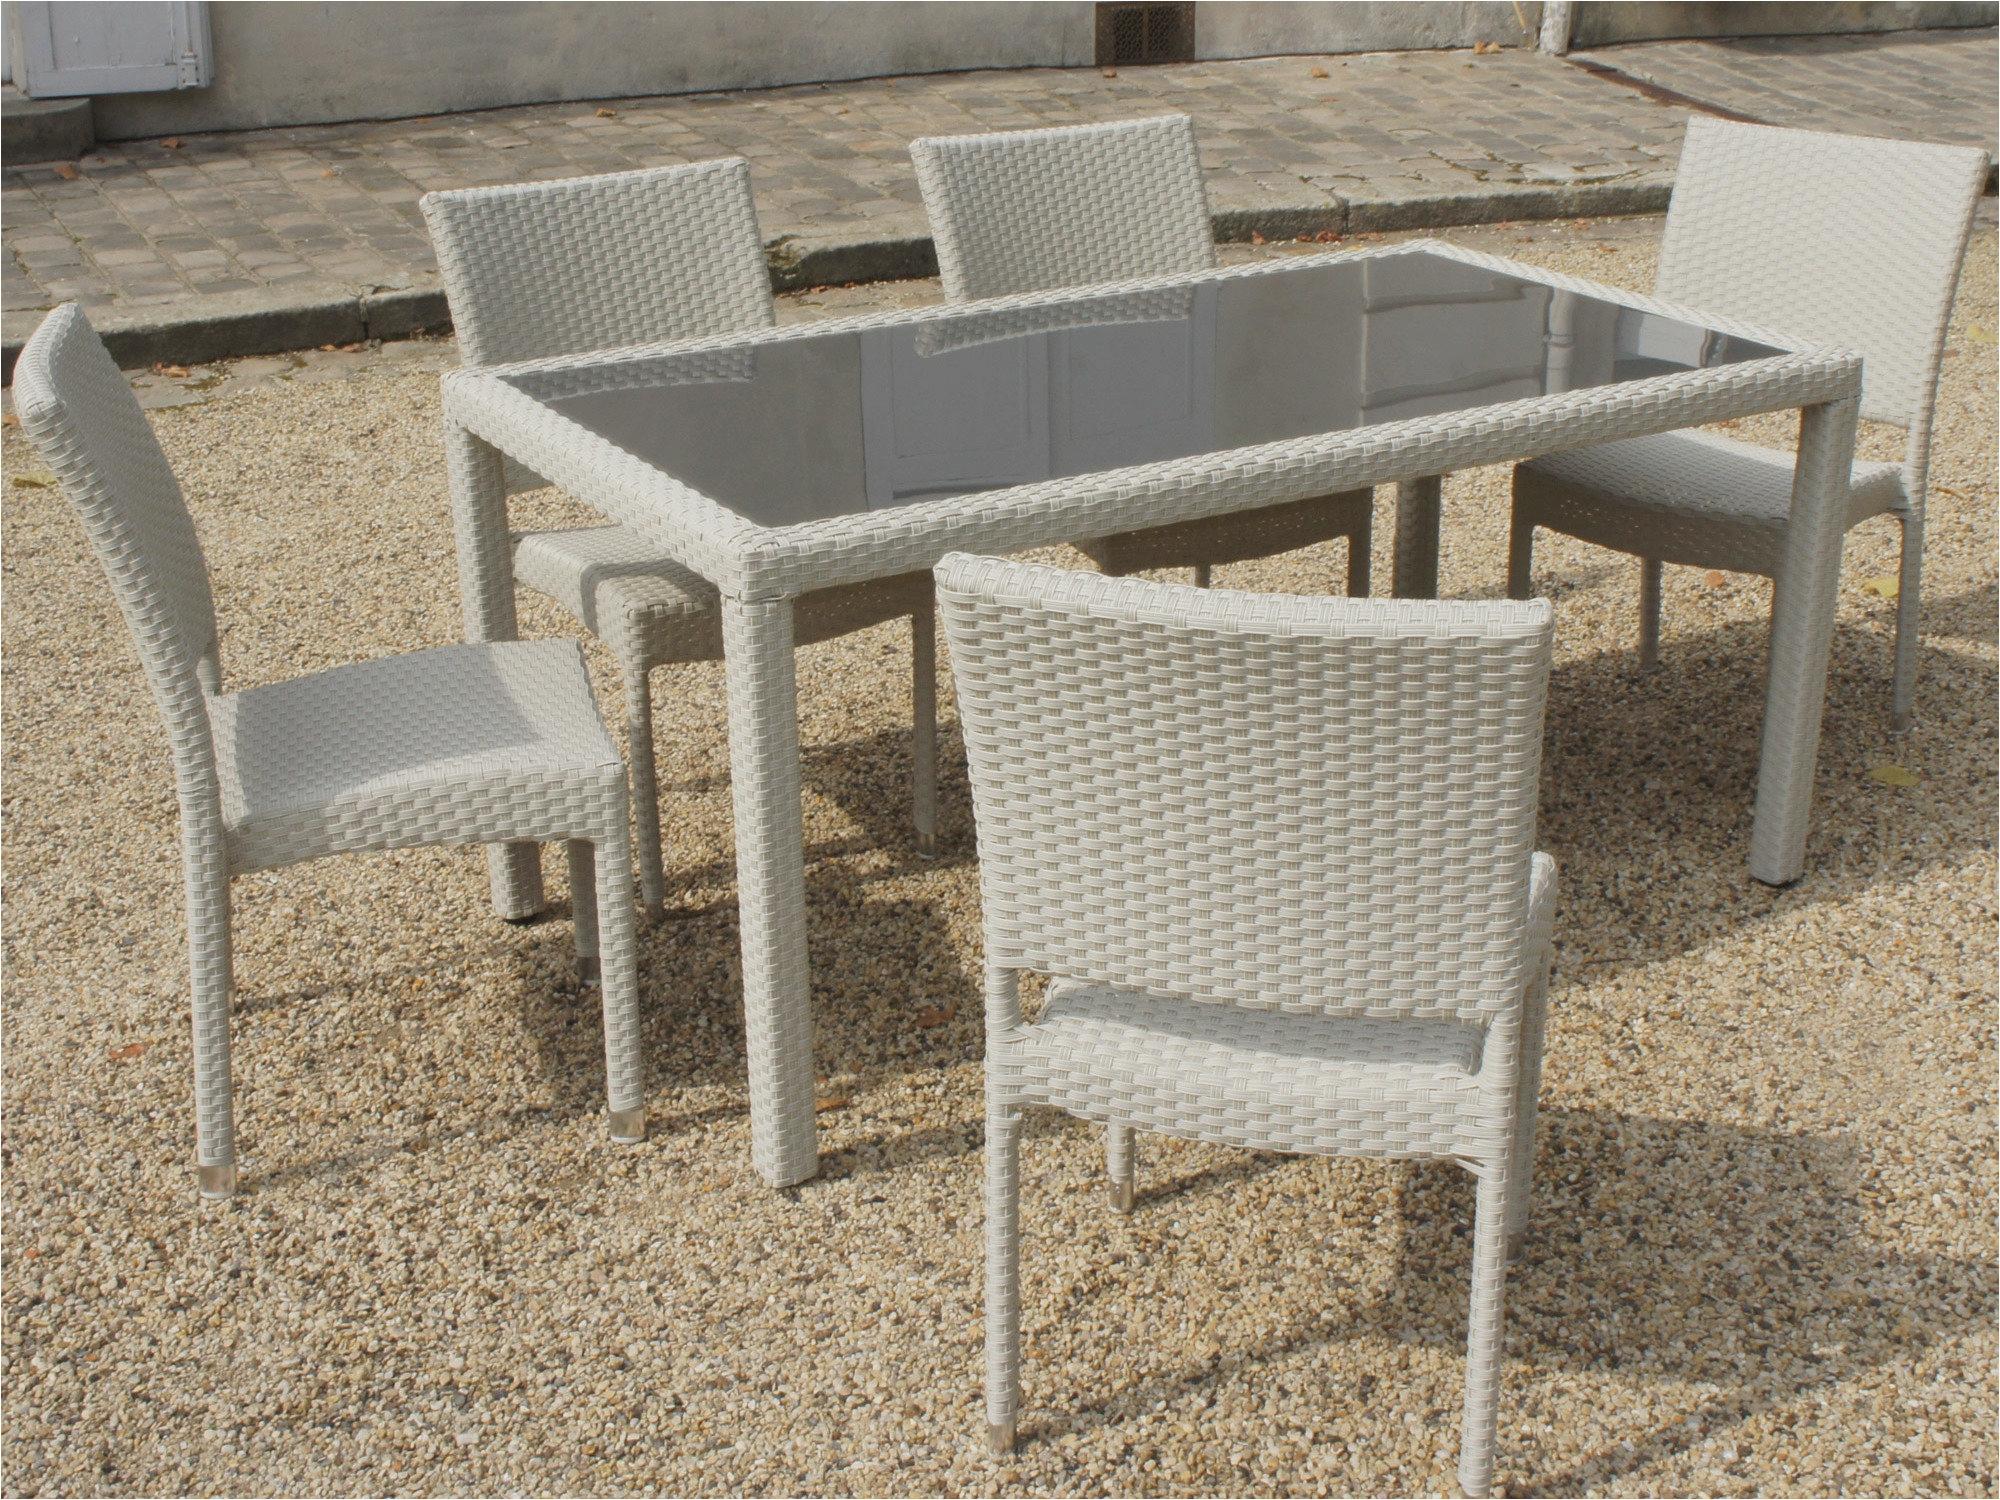 la redoute salon de jardin resine tressee magnifique table jardin 10 personnes 6